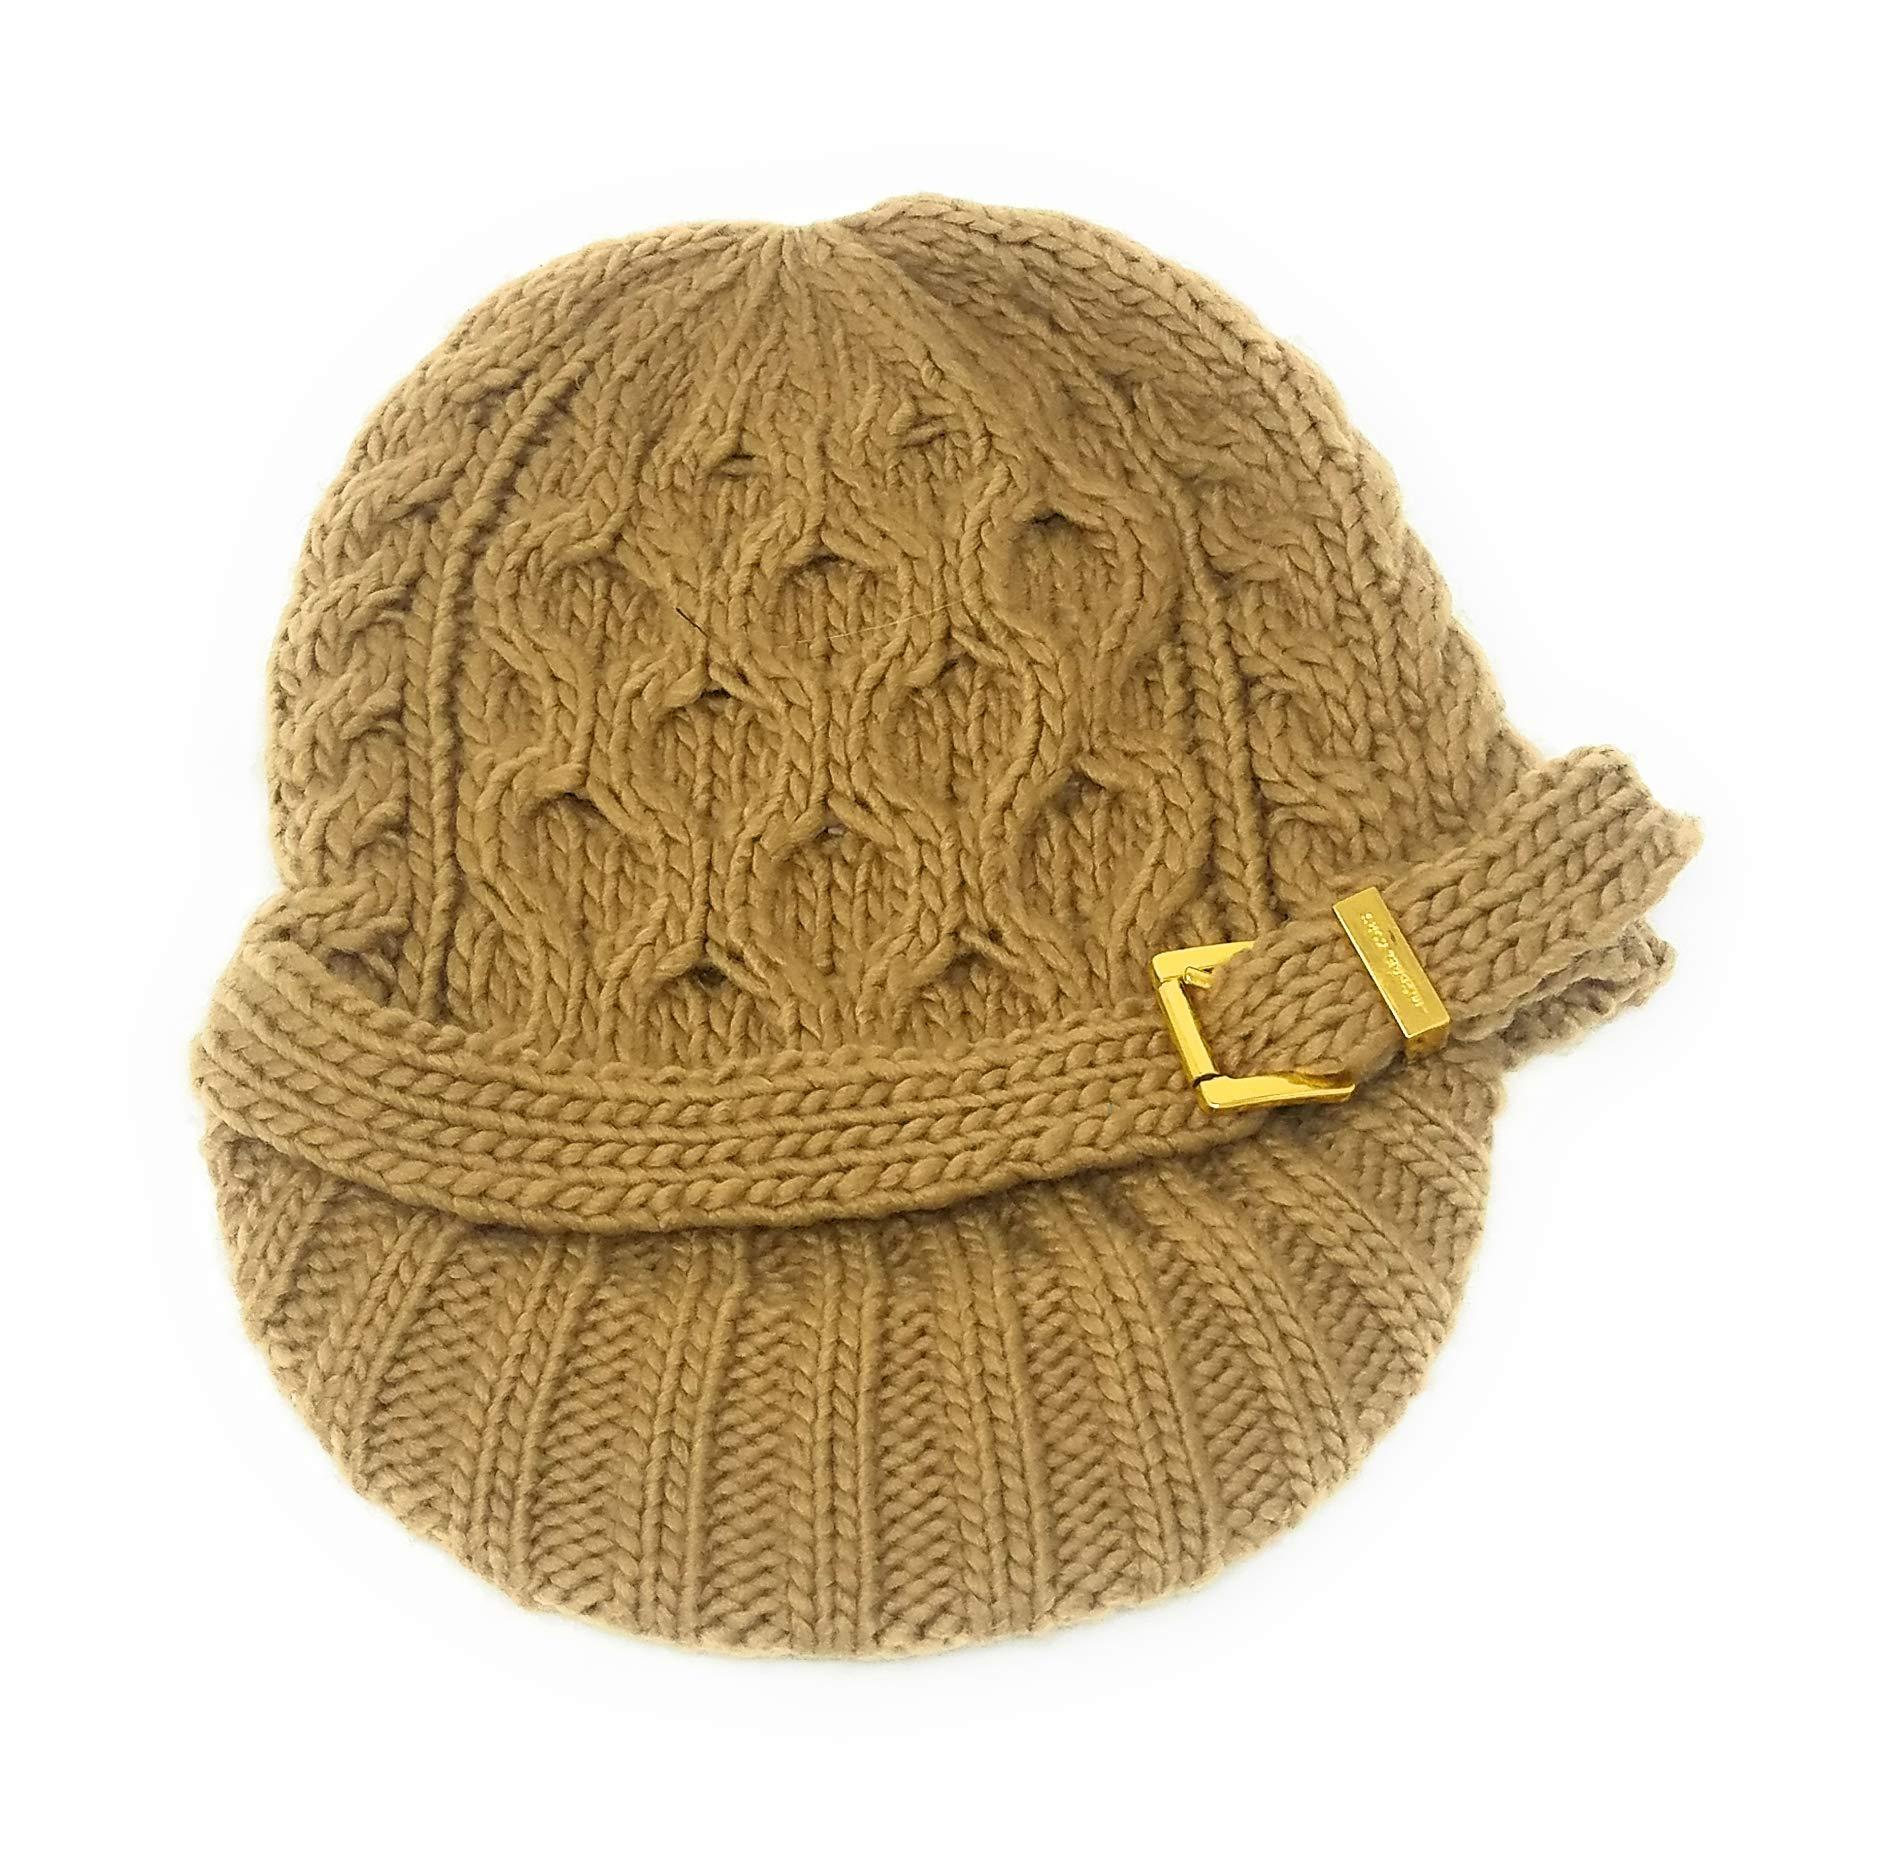 Michael Kors Cable Knit Newsboy Buckle Hat,Camel by Michael Michael Kors